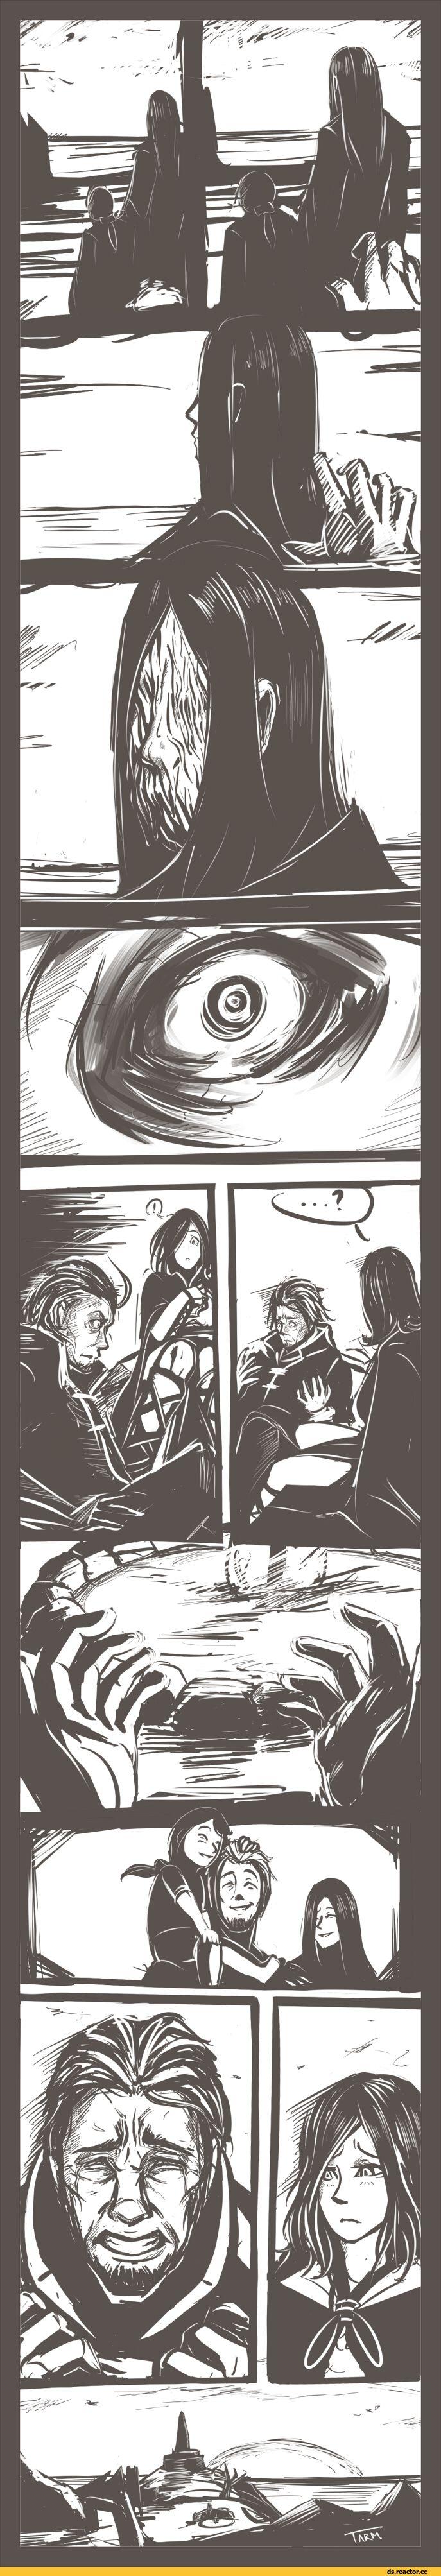 Dark Souls, fandoms, Dark Souls 2, DS characters, DS art, DS comics, Emerald Herald, Chosen Undead, Funny comics, comics with humor and their translations